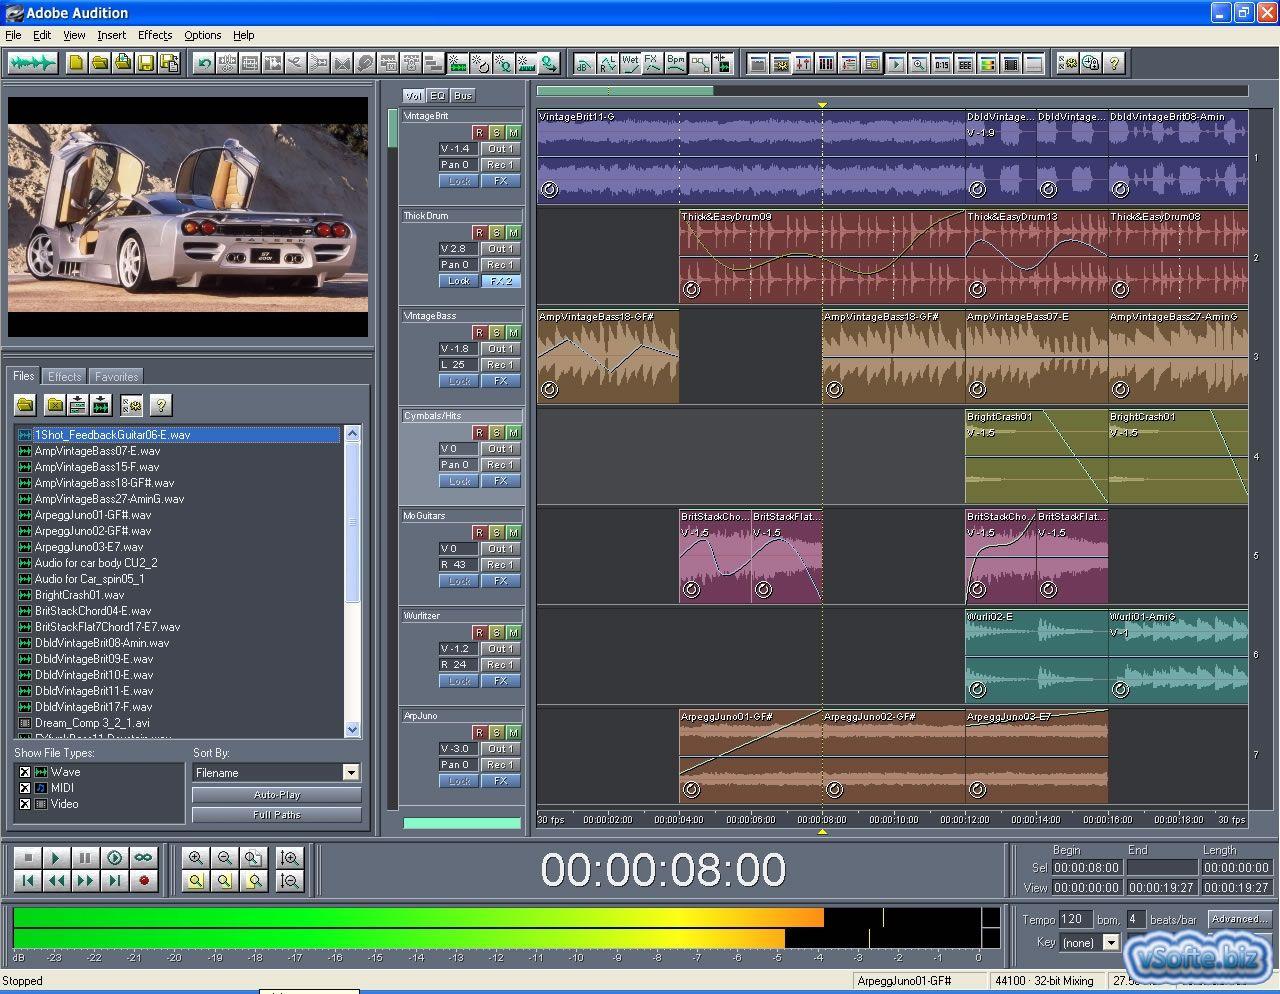 Adobe Audition Free Download Full Version - SoftFiler